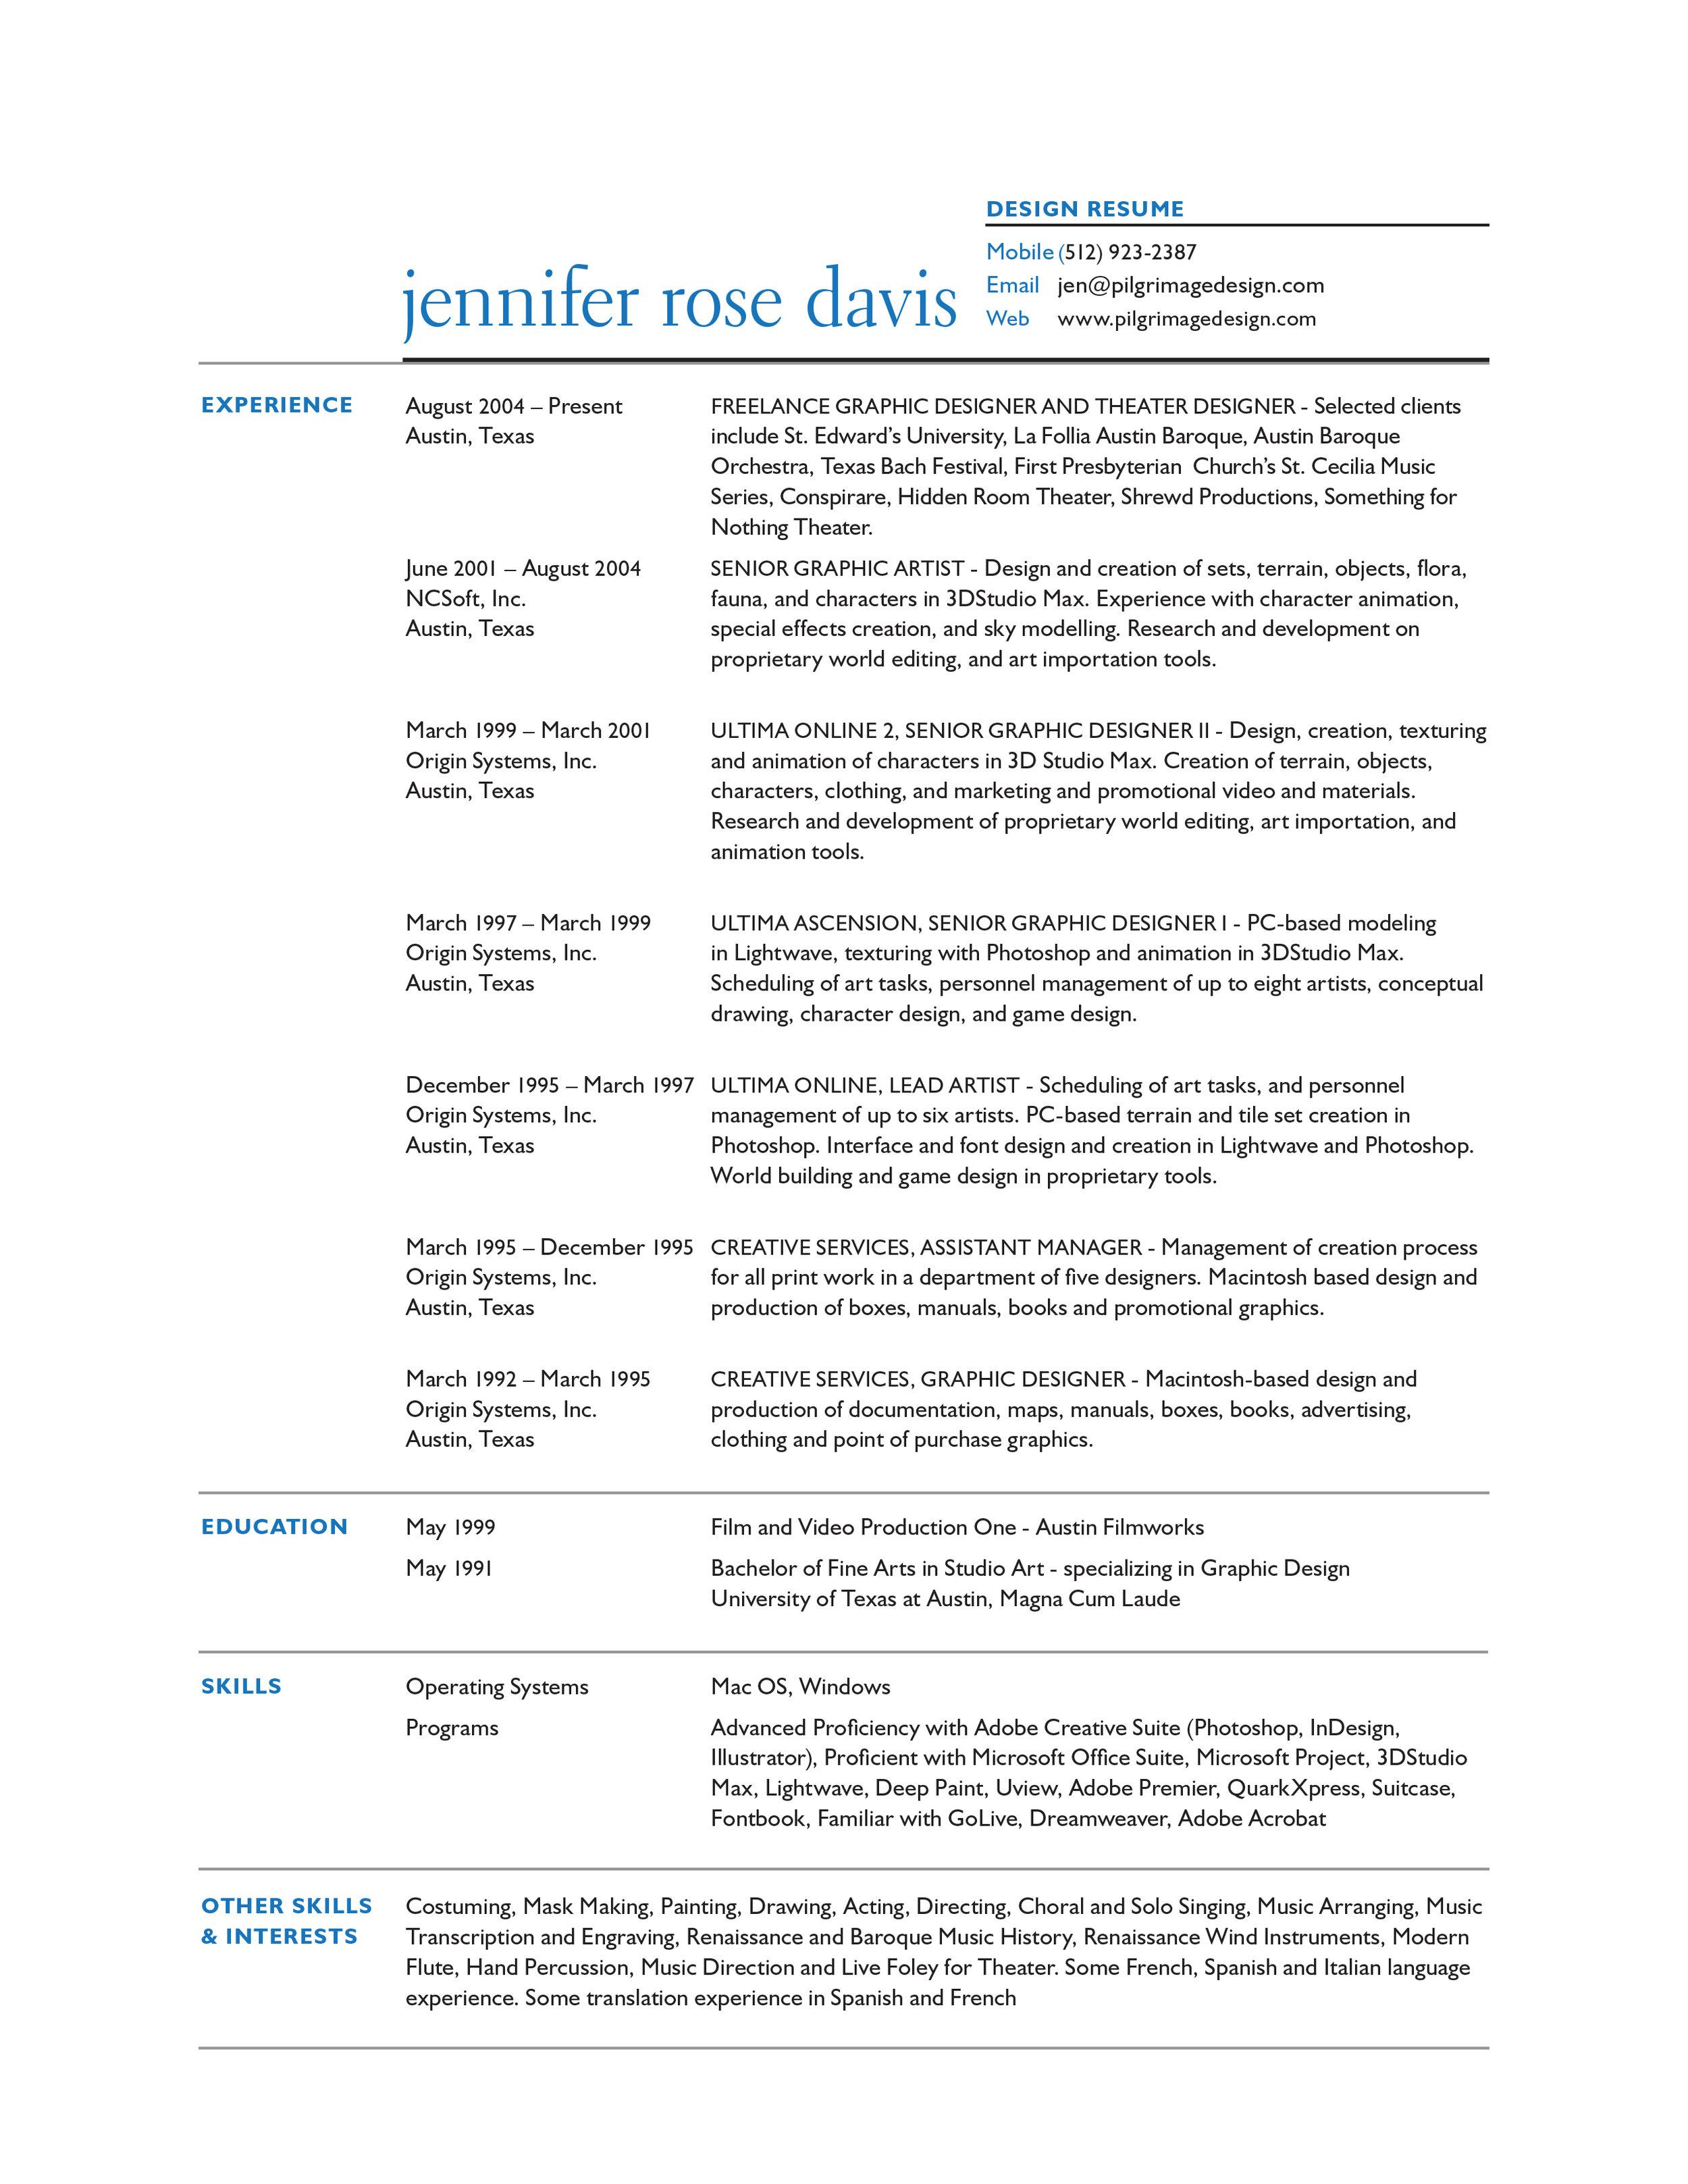 Jennifer Rose Davis Resume-1.jpg